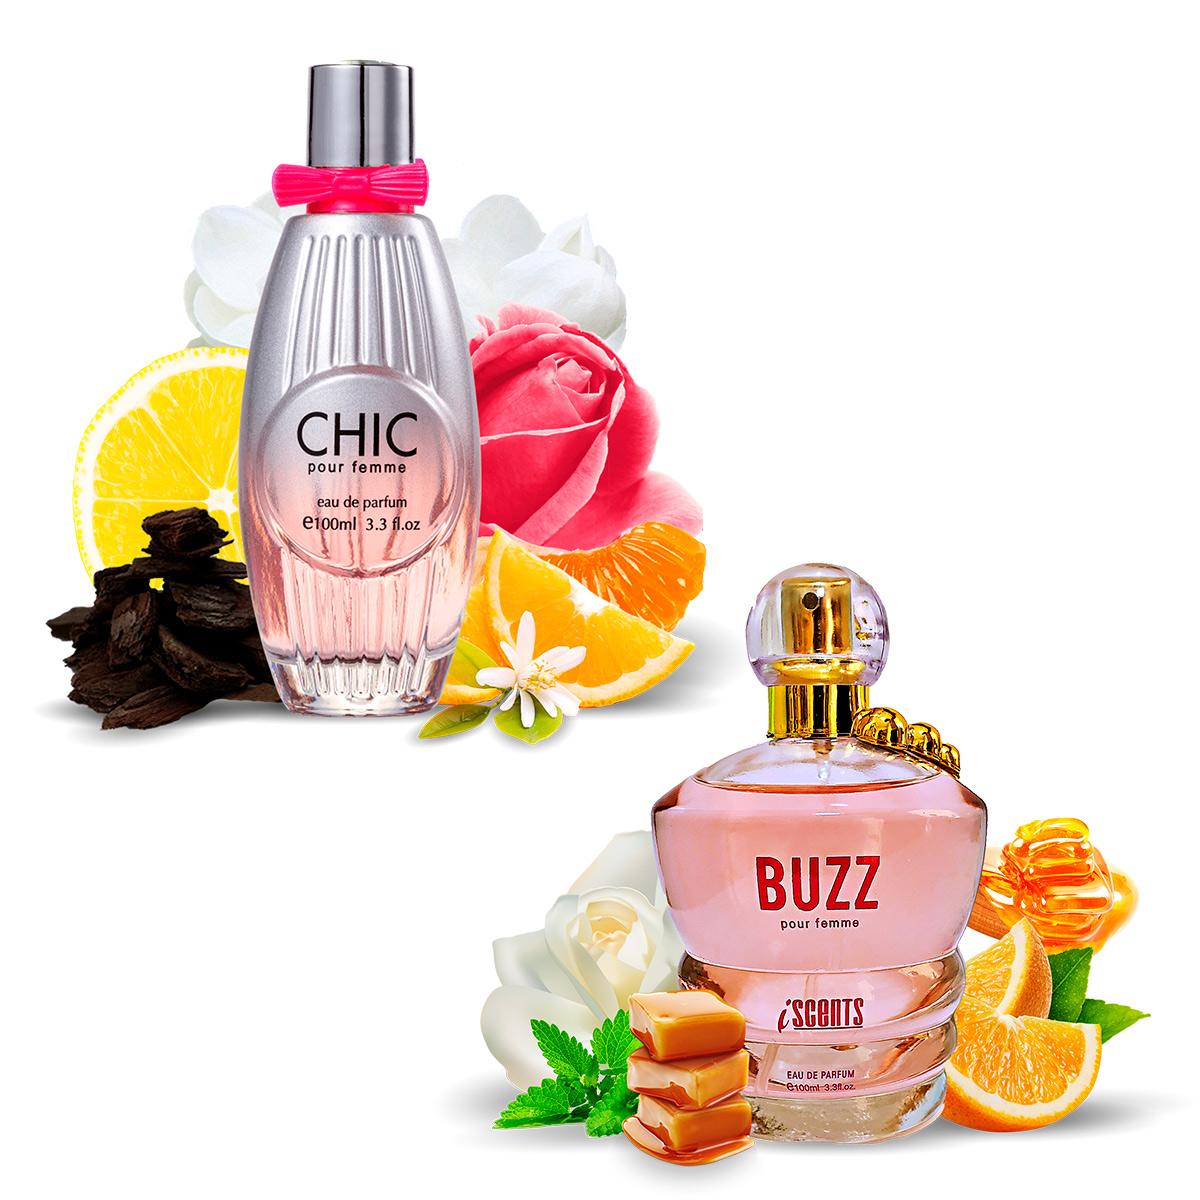 Kit 2 Perfumes Importados Chic e Buzz I Scents